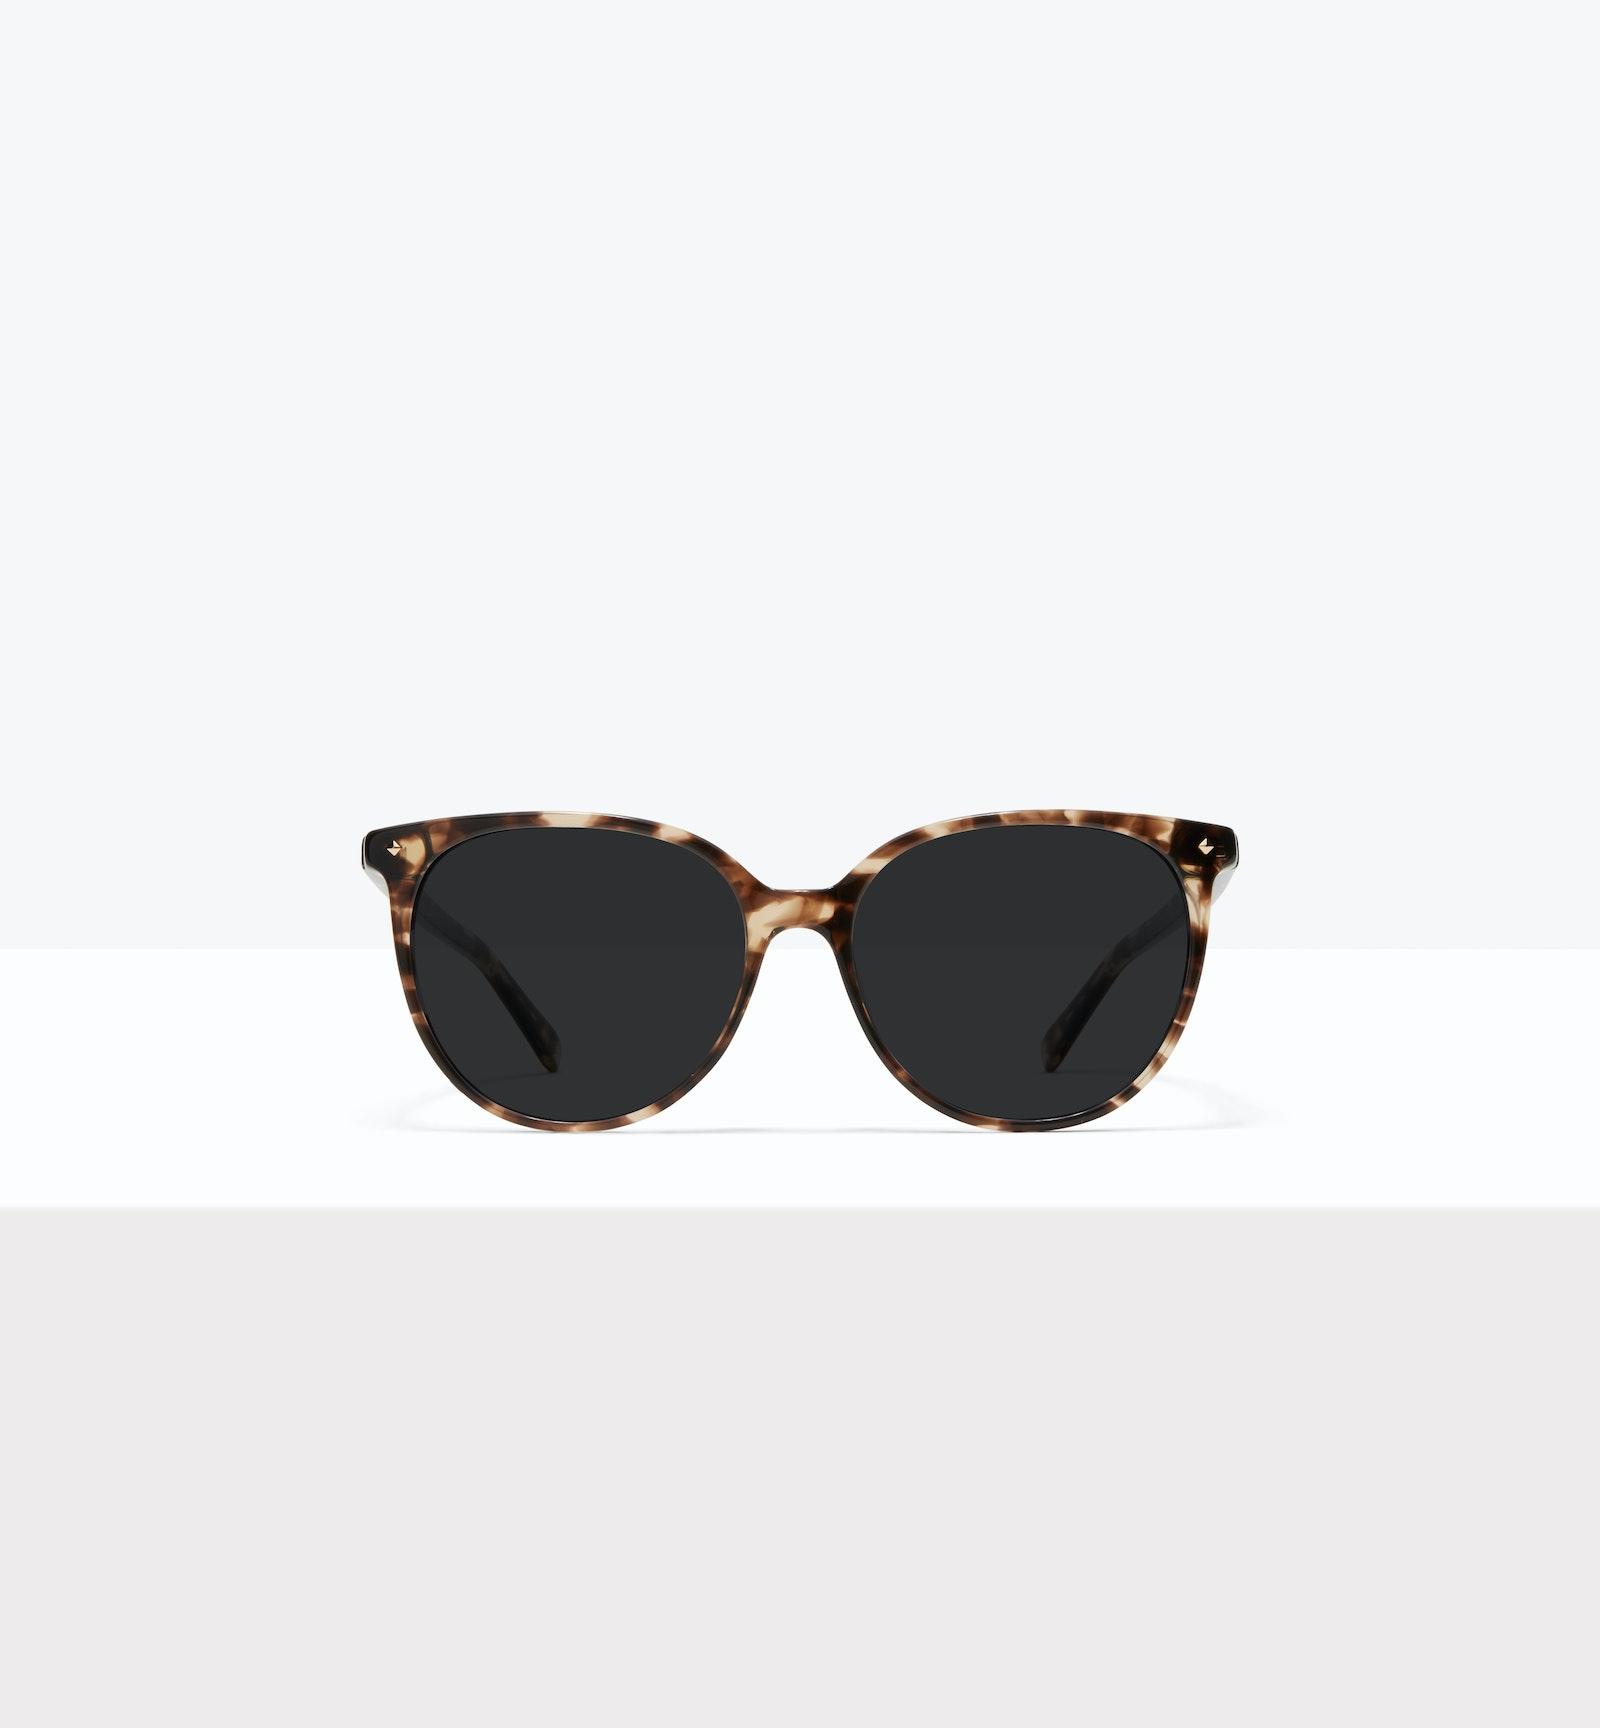 Affordable Fashion Glasses Round Sunglasses Women Area L Leopard